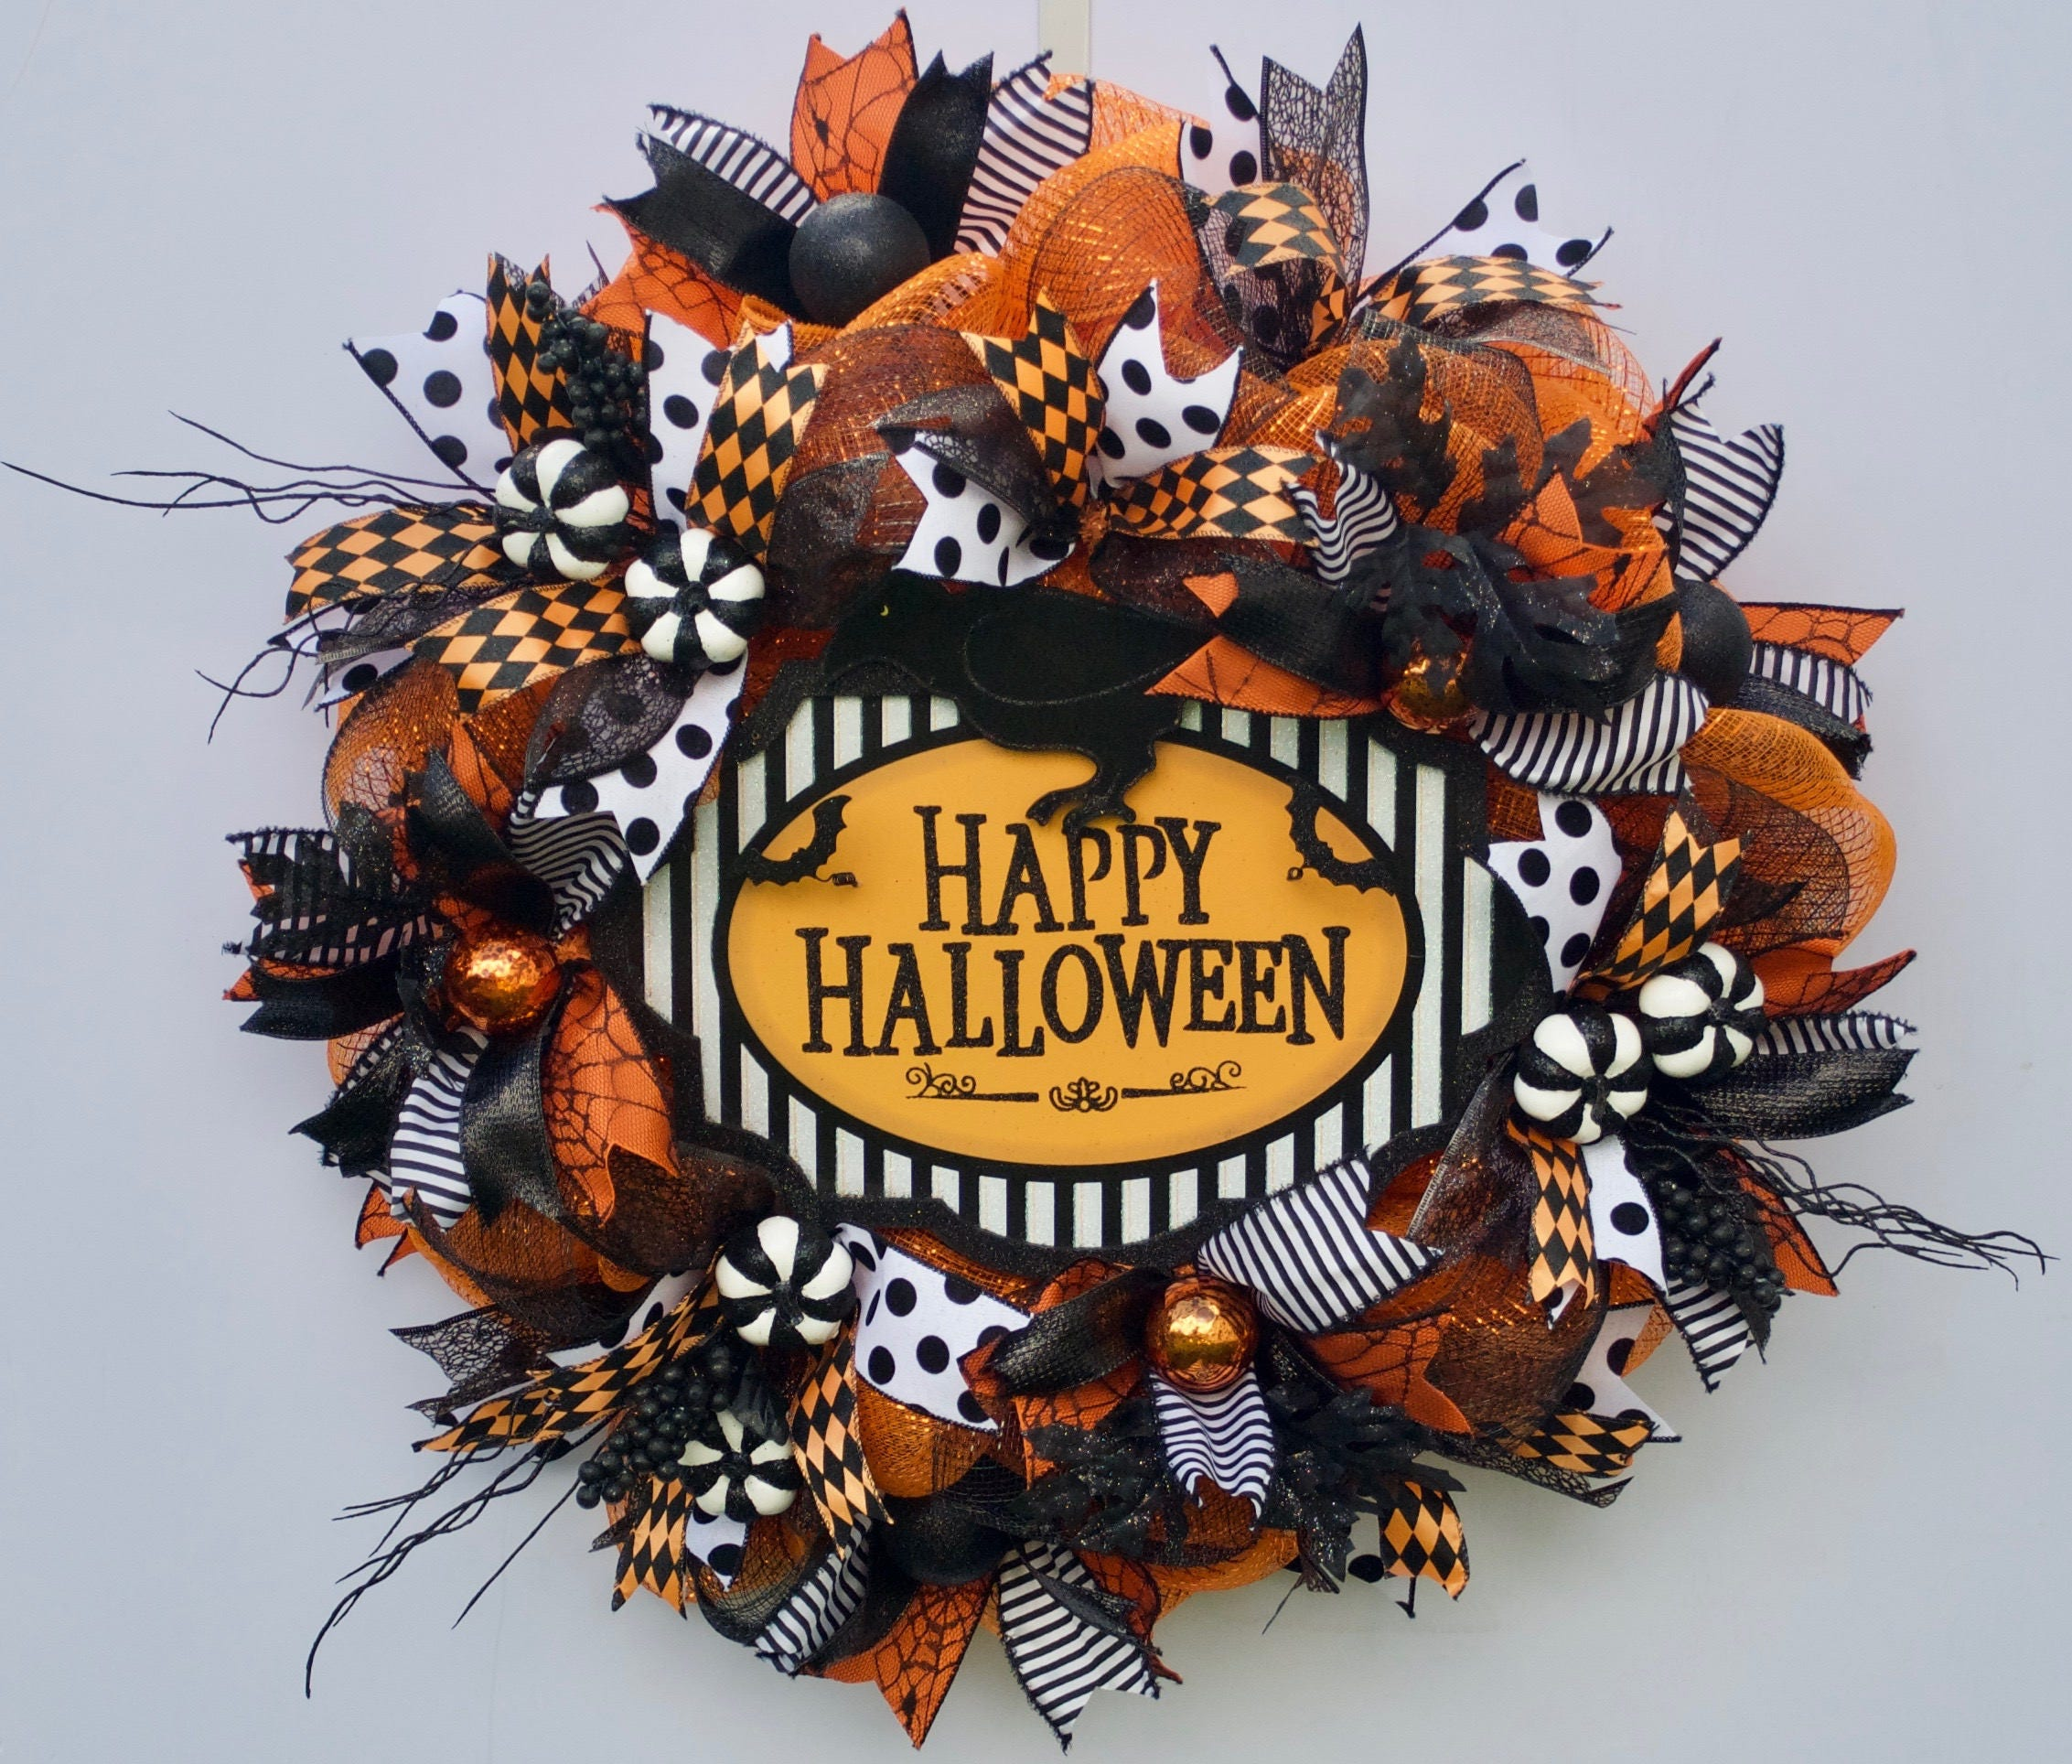 Black Flower And Crow Halloween Wreath: Happy Halloween Wreath Trick Or Treat Wreath Black Crow